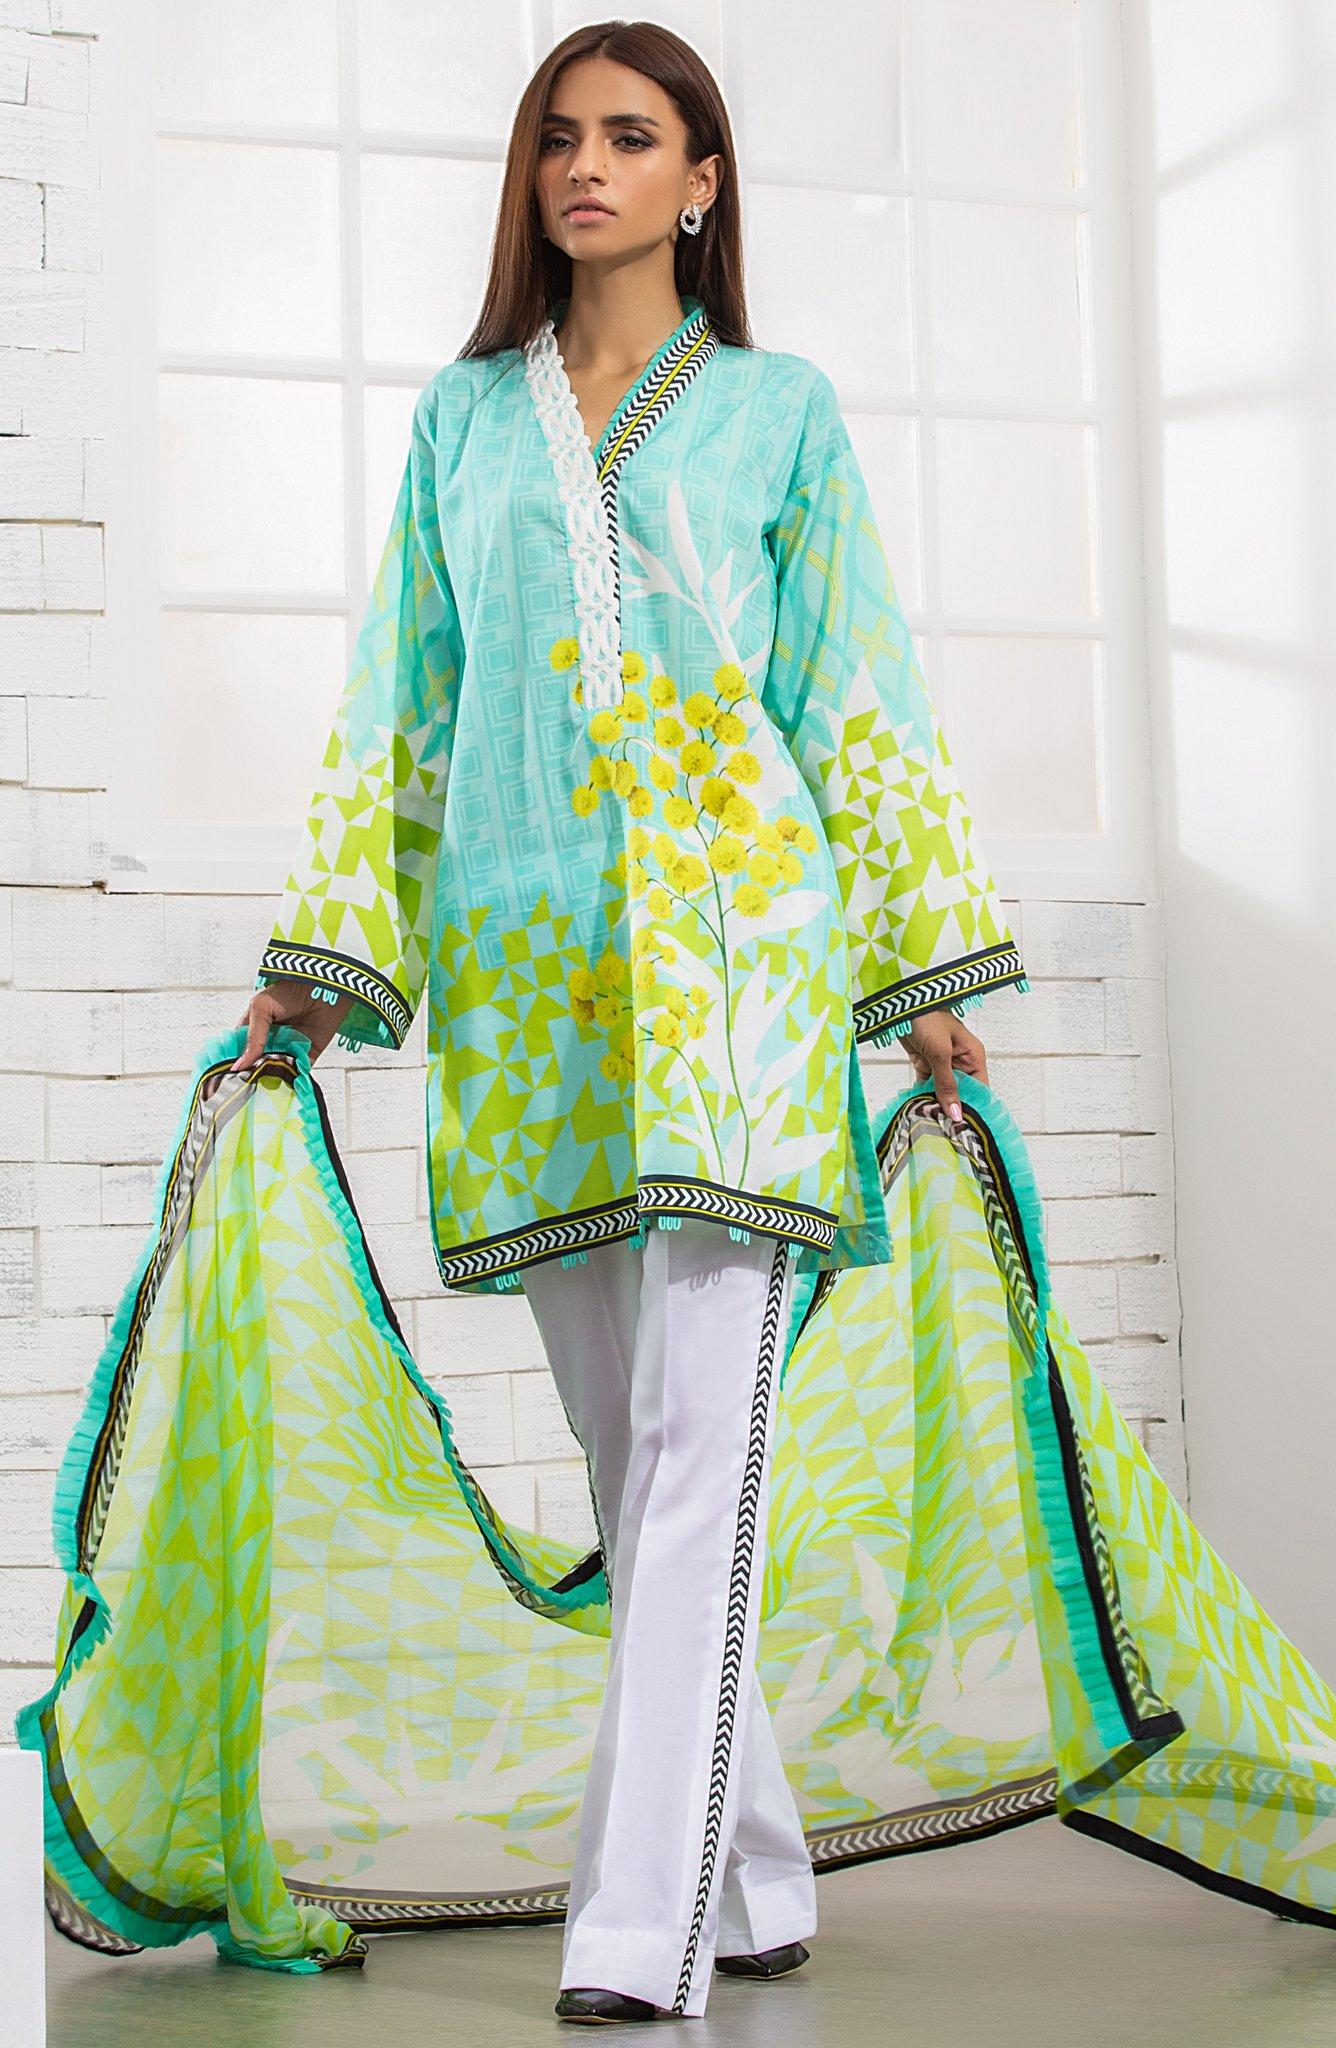 Orient Textiles The Nuovo Zephyr Otl 13 - Lawncollection pk